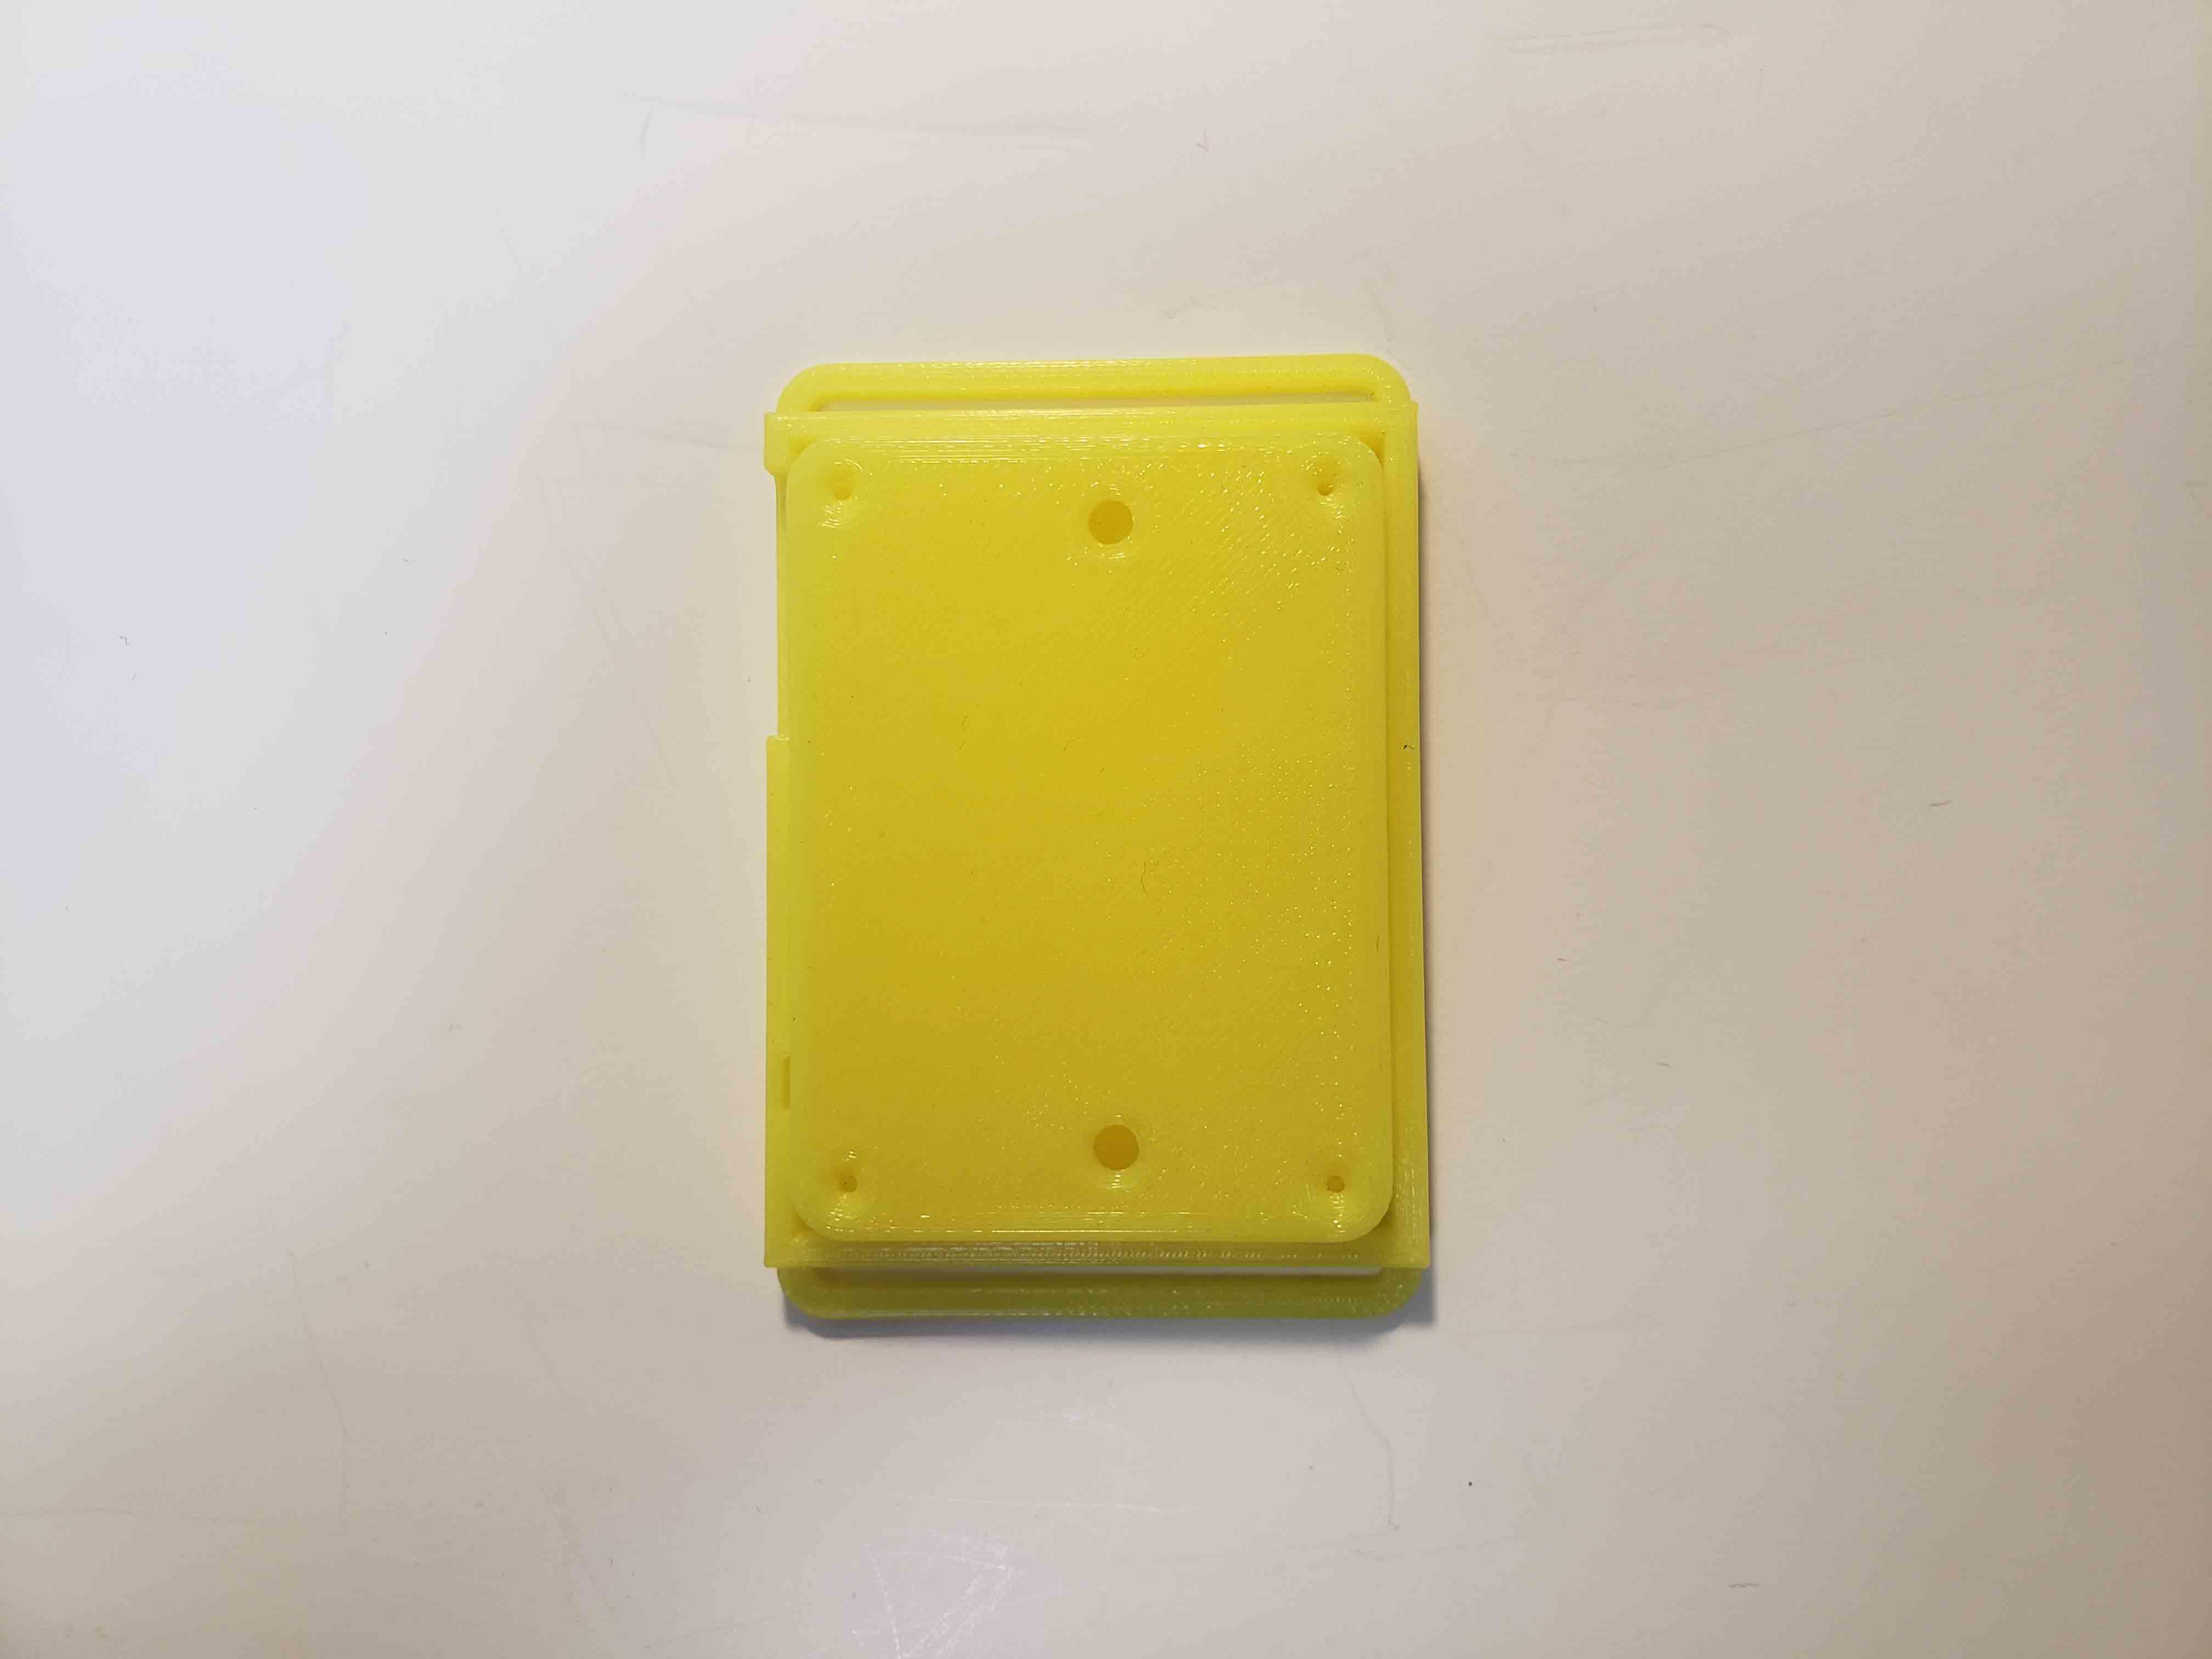 Prototype-ECG-Housings-Assembly-Yellow-Thu-Hole-v1.0